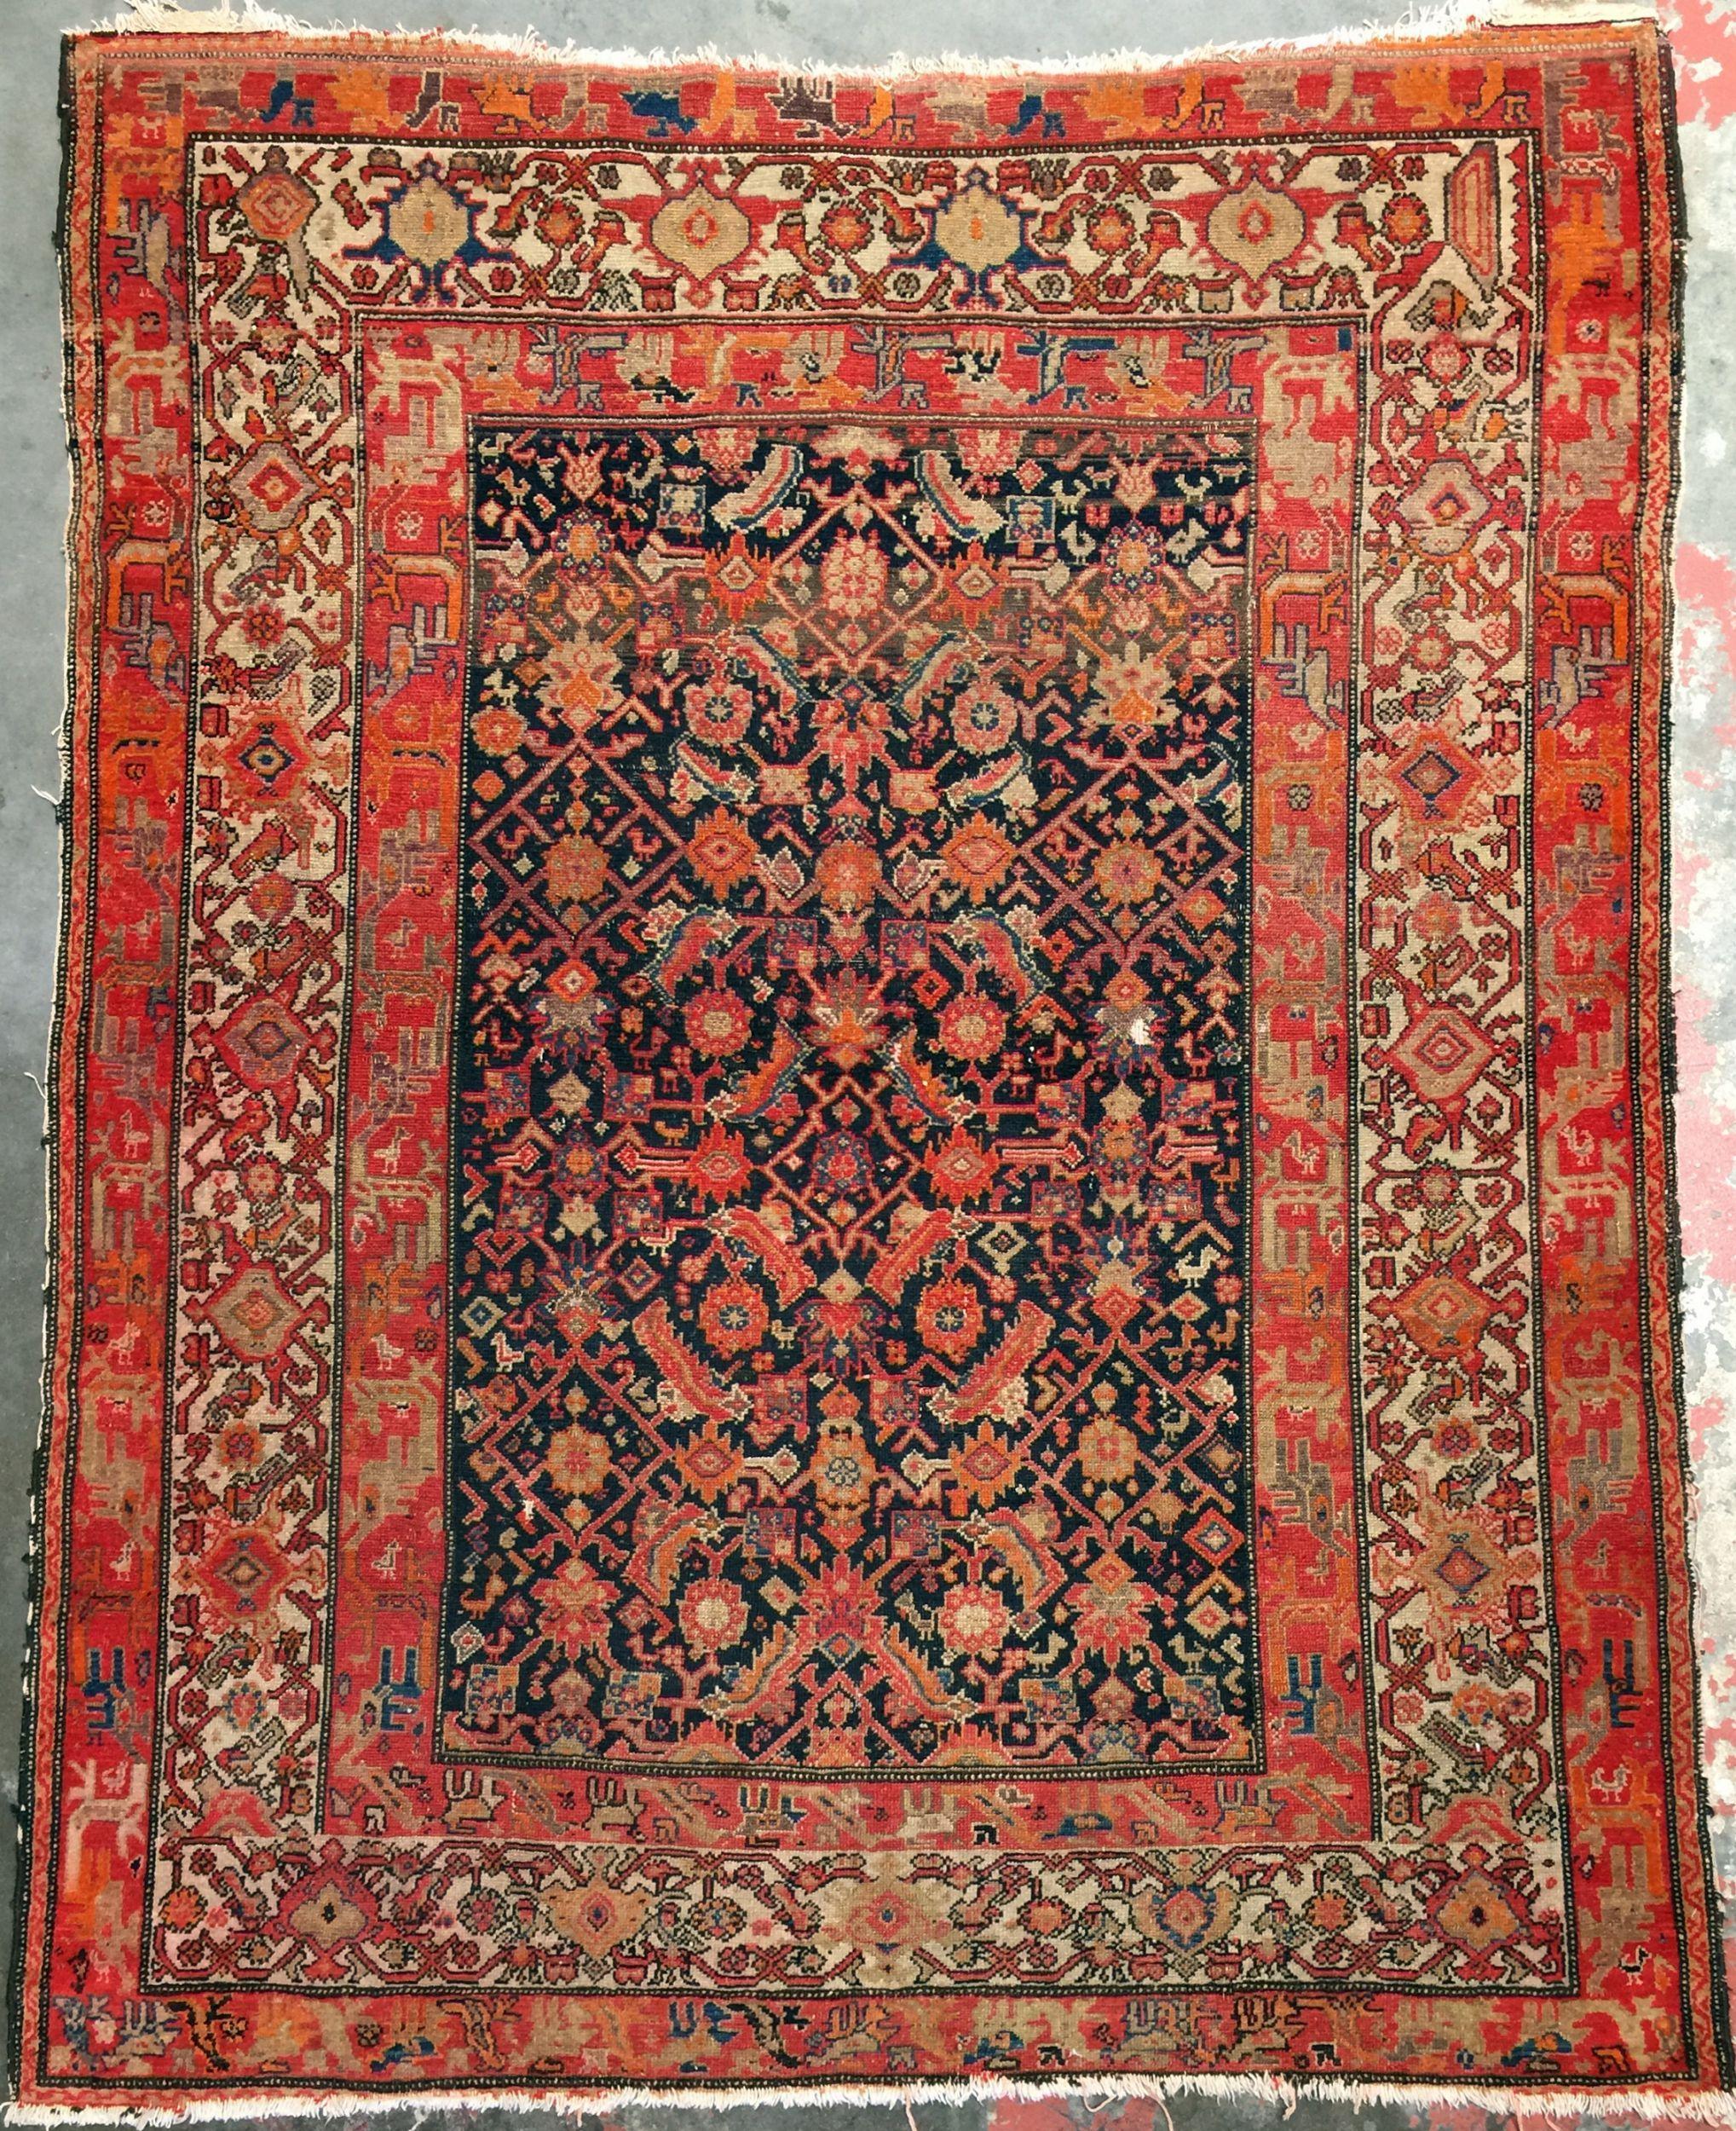 Vintage Persian Malayer Rug 5x6 Worn Rug Rugs On Carpet Persian Malayer Rug Textured Carpet